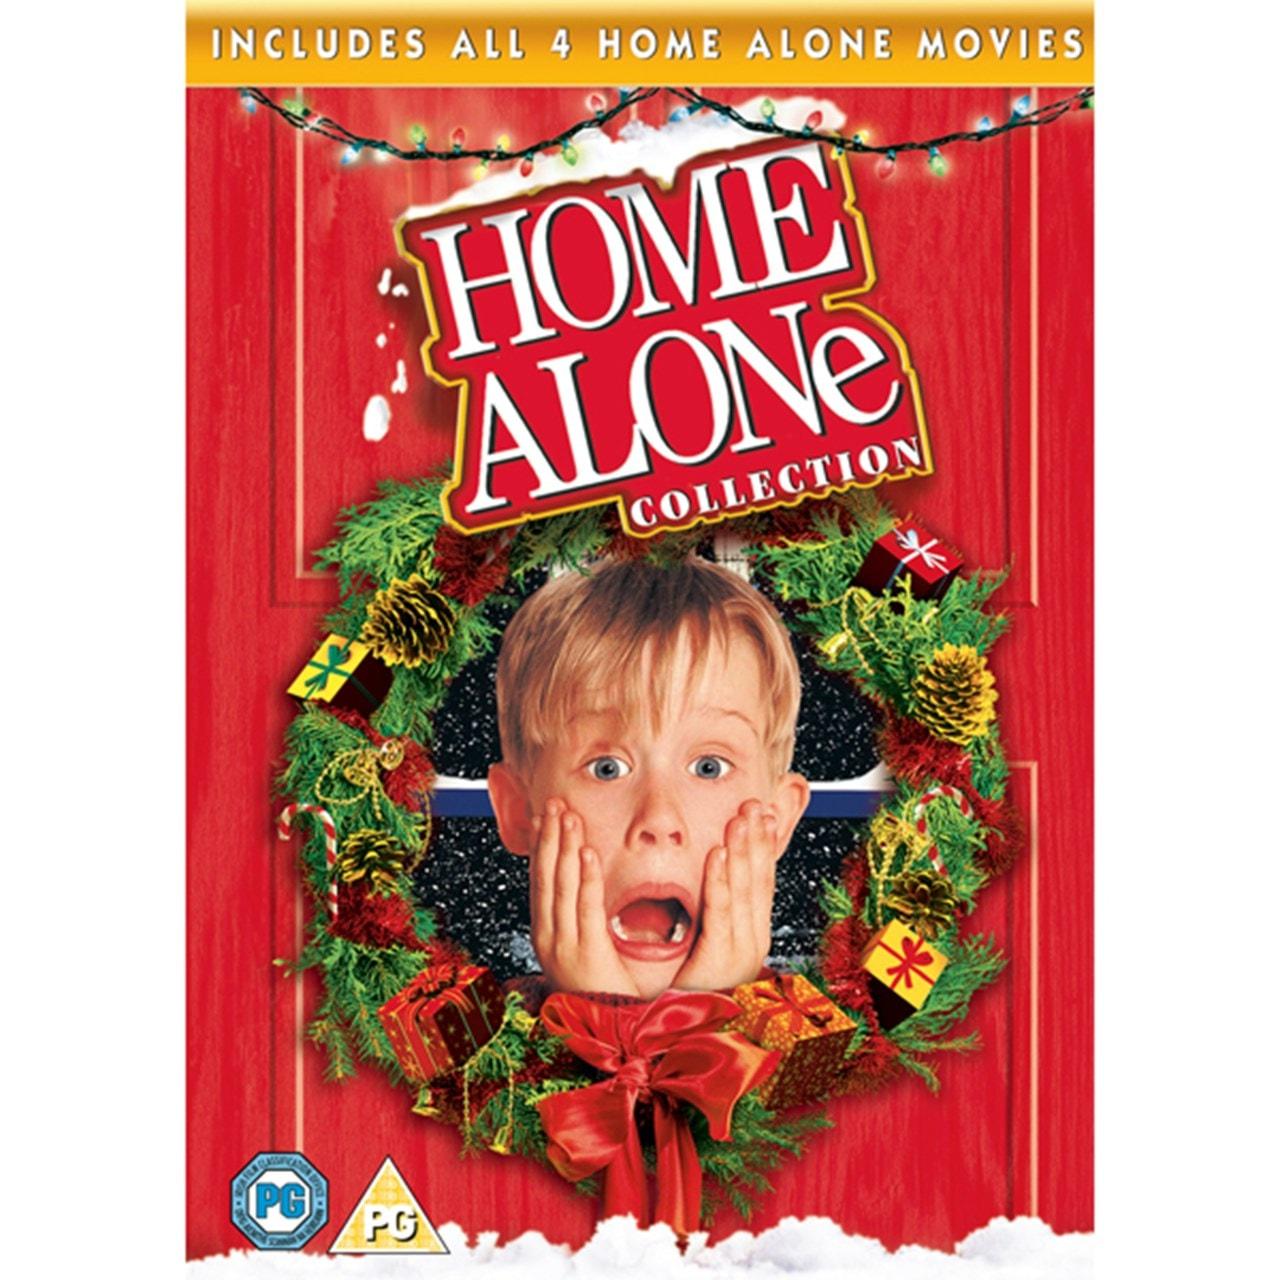 Home Alone/Home Alone 2 /Home Alone 3/Home Alone 4 - 3